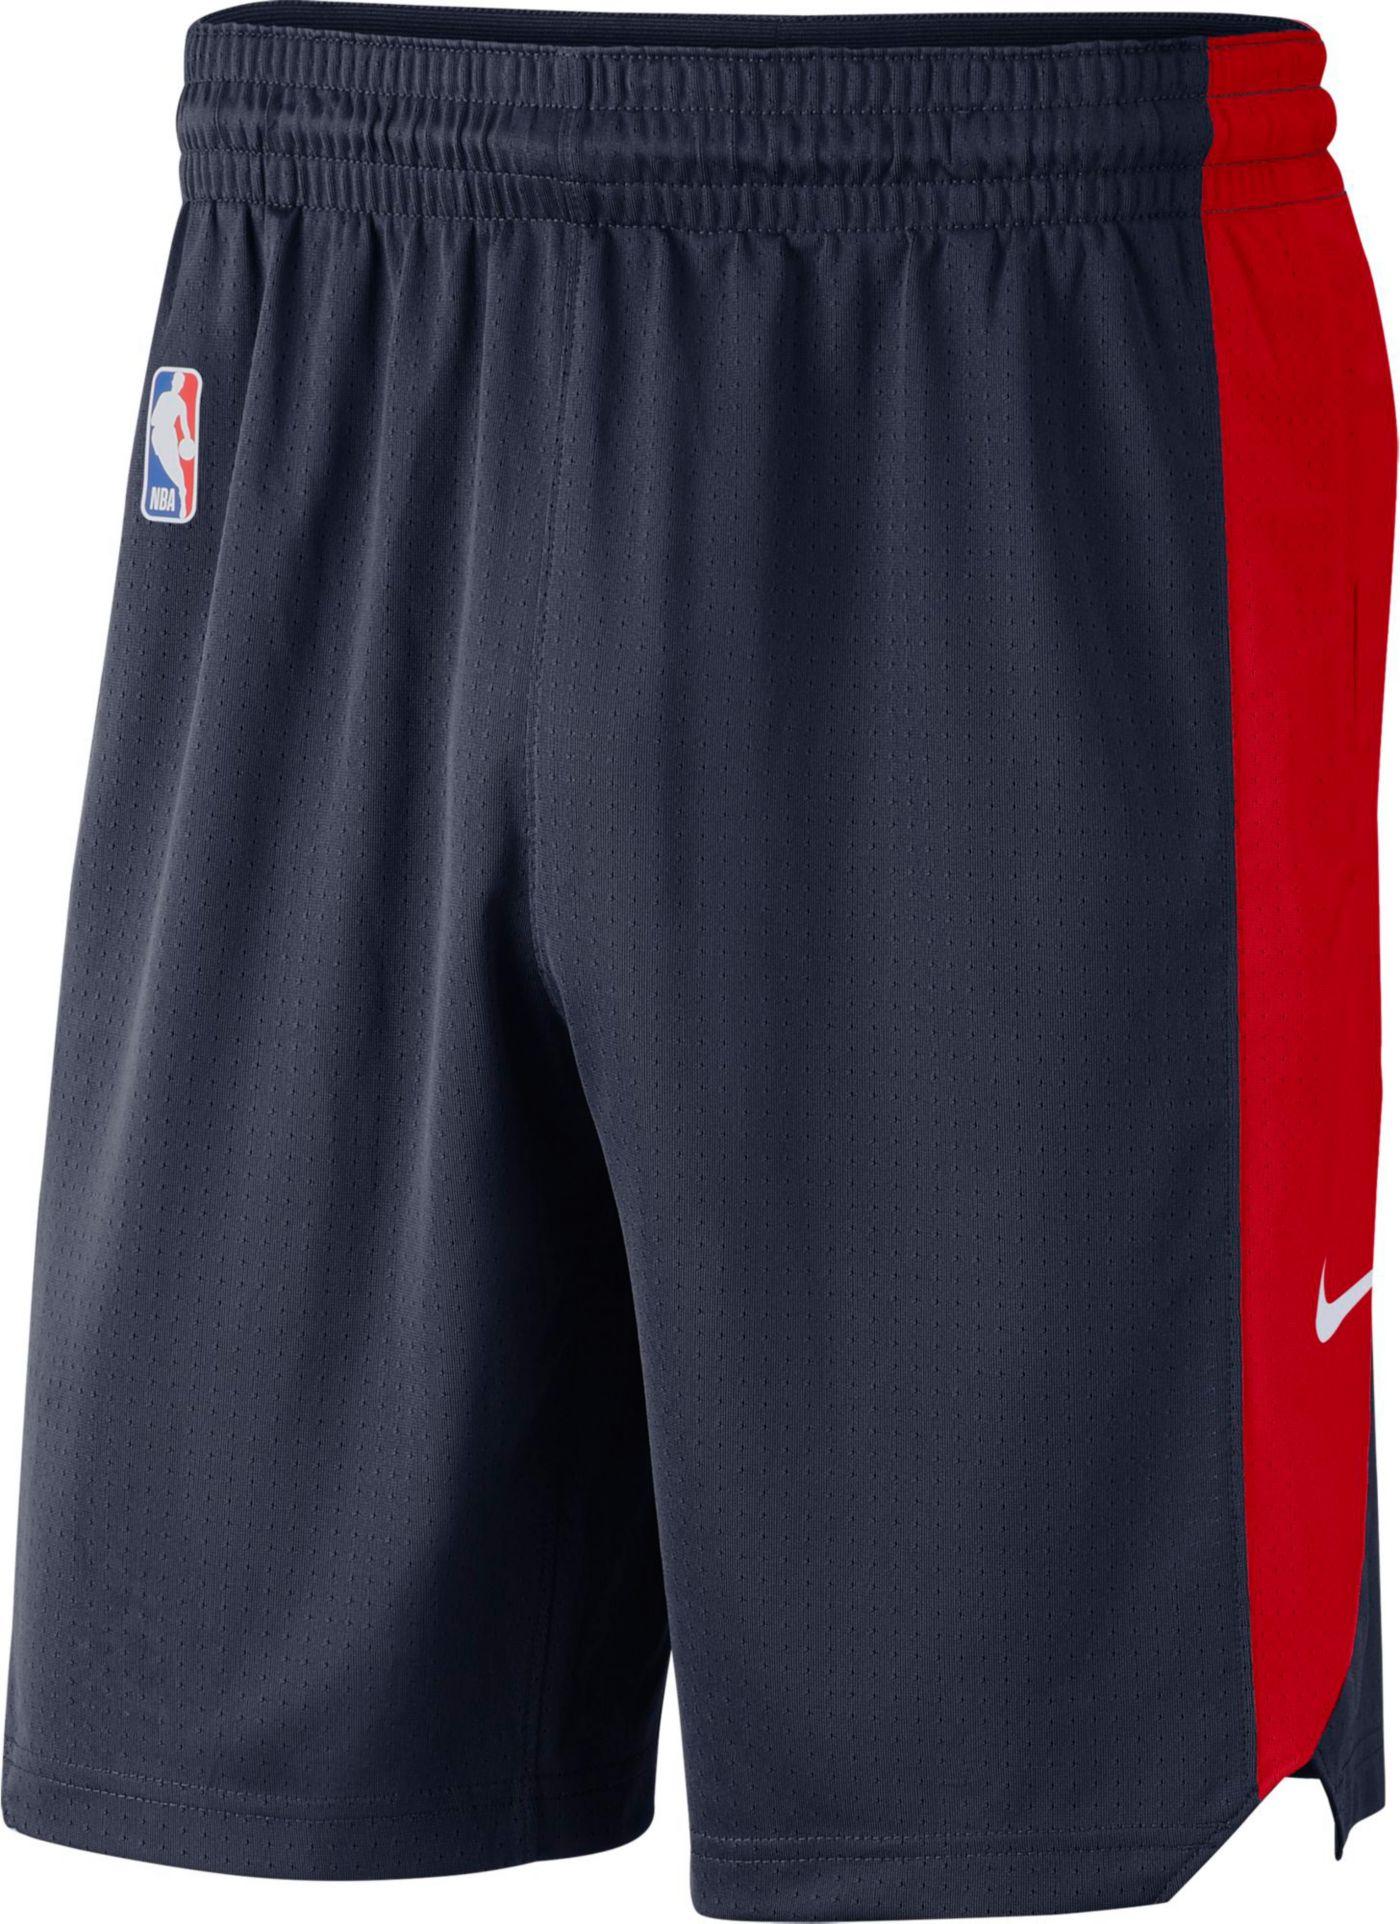 Nike Men's Washington Wizards Dri-FIT Practice Shorts